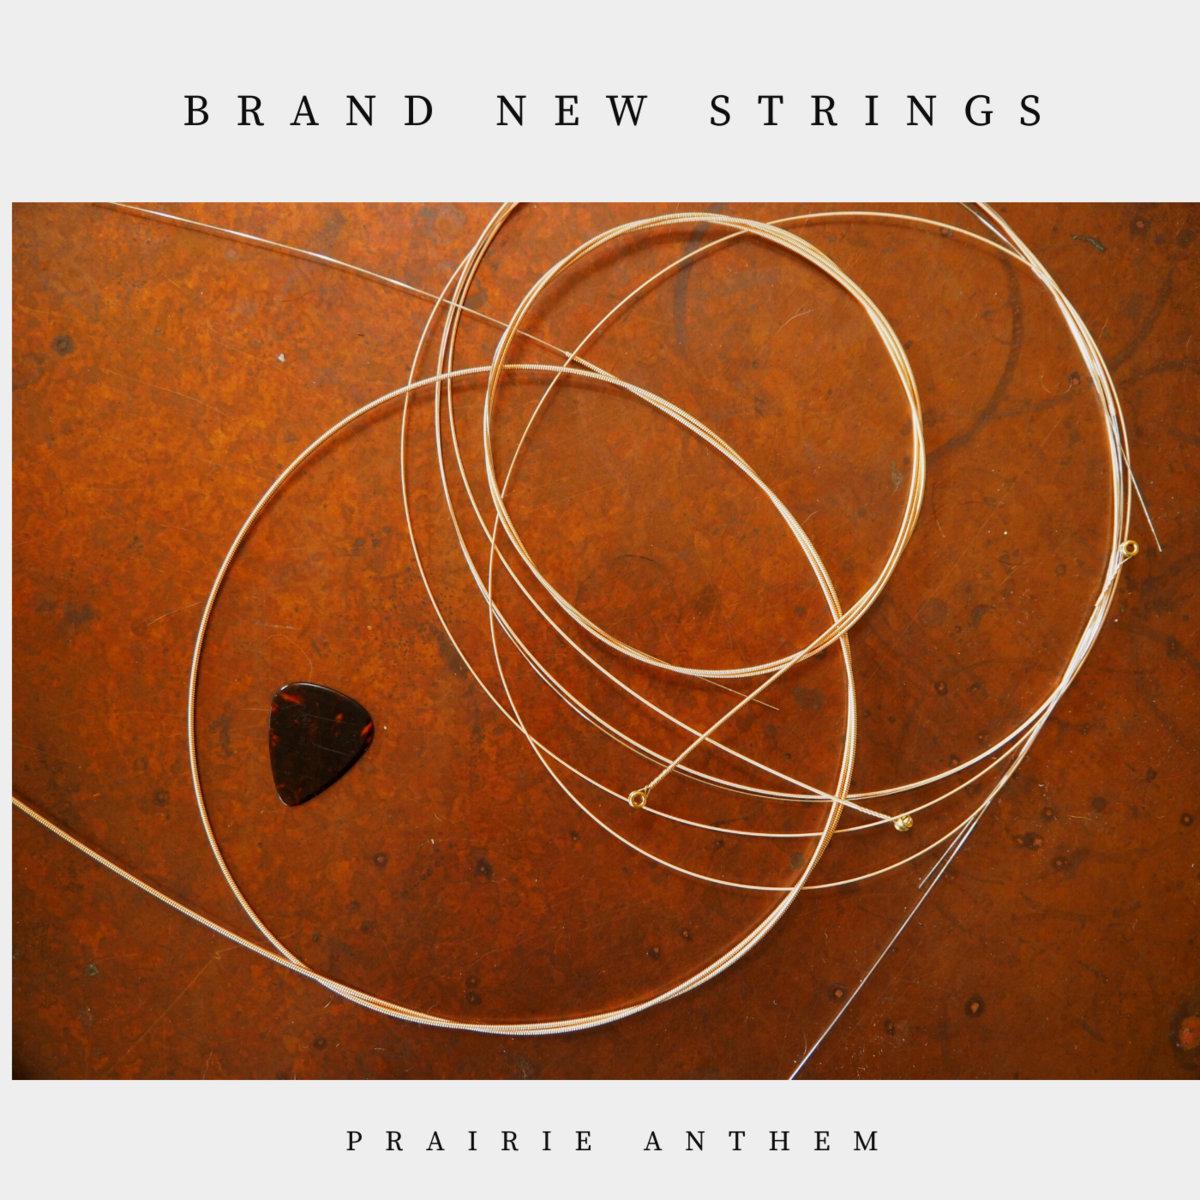 Brand New Strings by Prairie Anthem